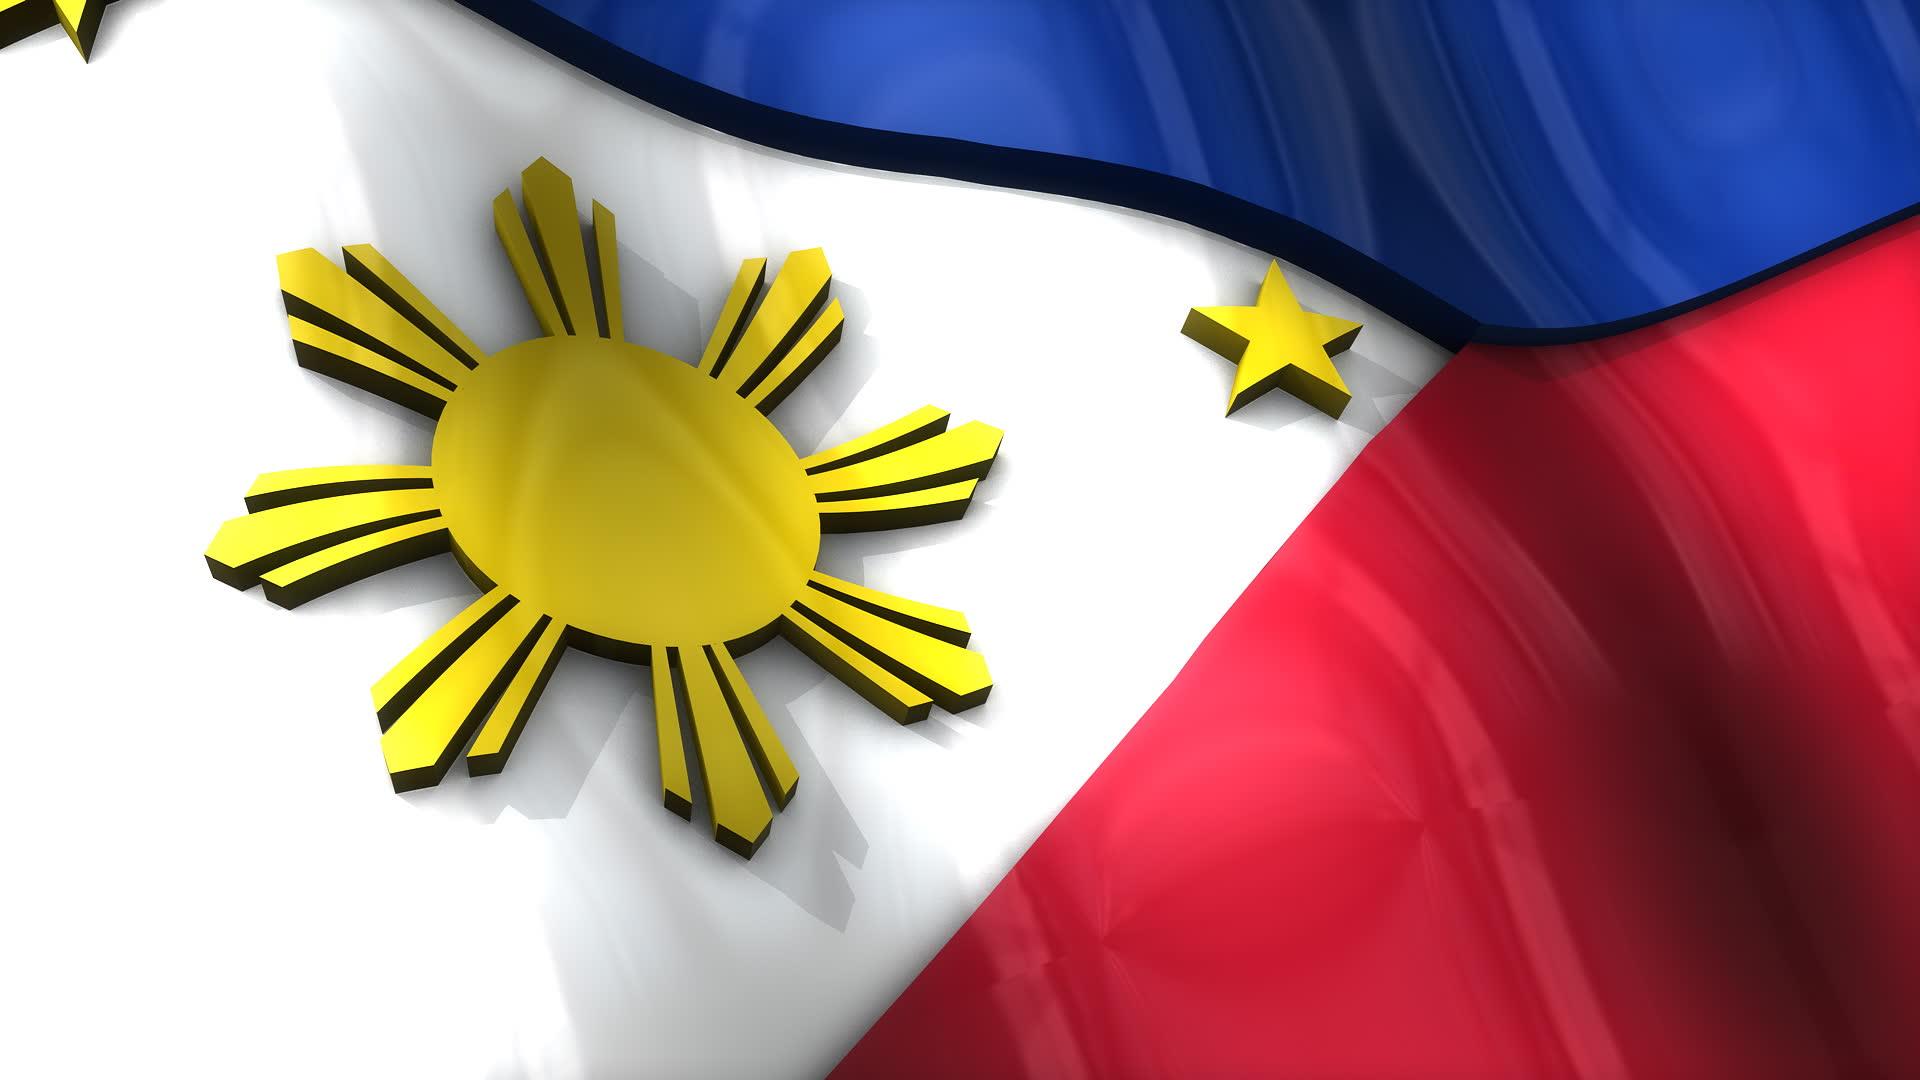 Philippines Flag Wallpaper - WallpaperSafari  Philippines Fla...